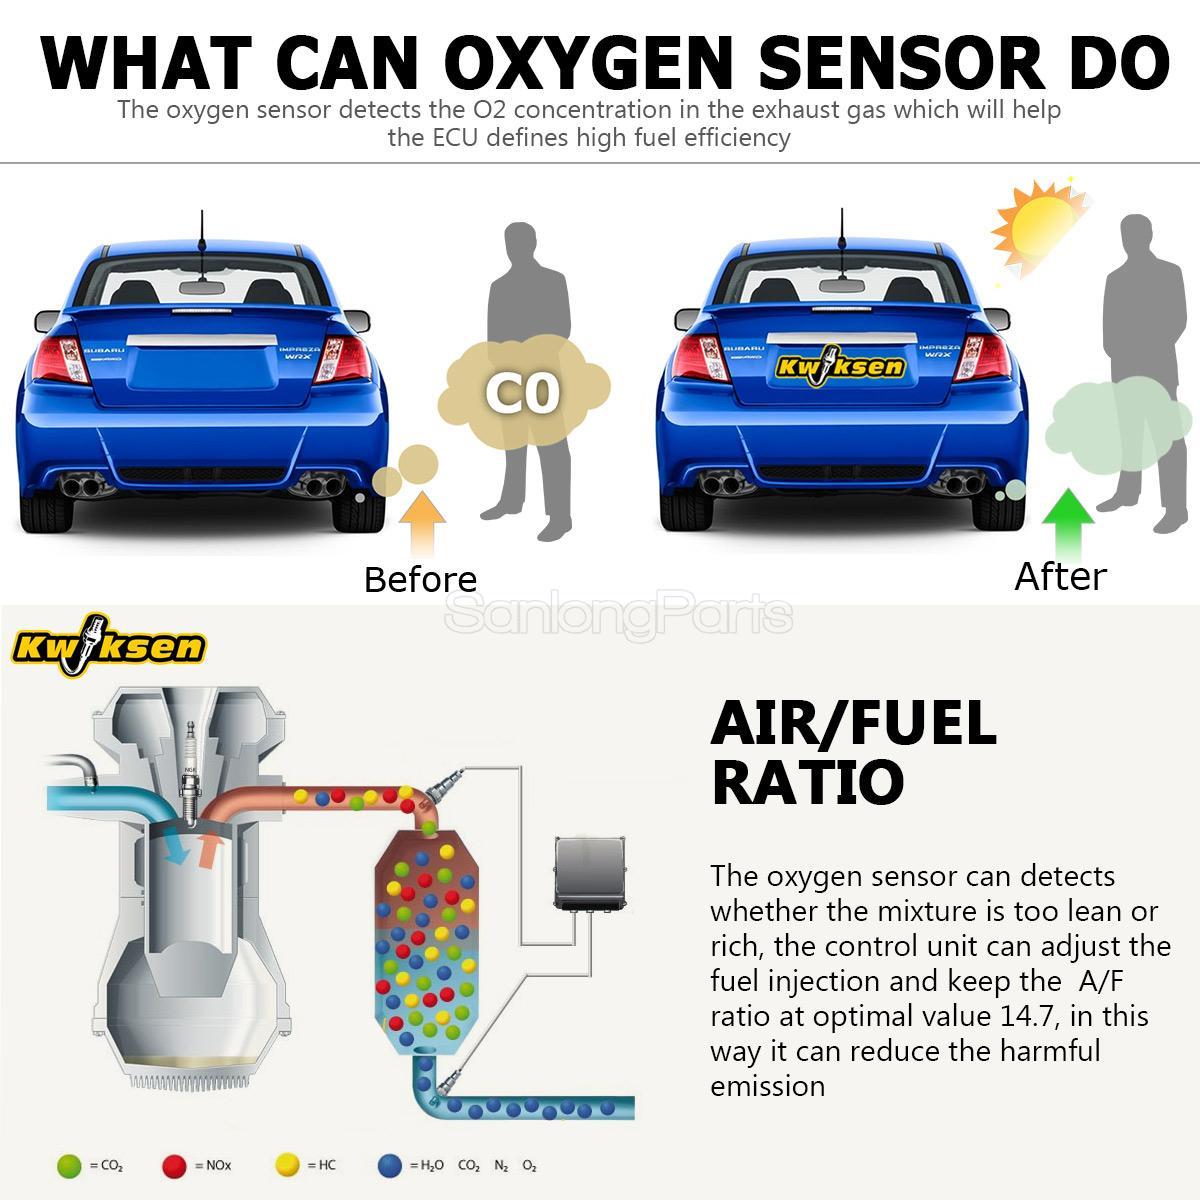 Details about 8946550130 Oxygen Sensor Upstream Right For 2002-2010 Lexus  SC430 4 3L